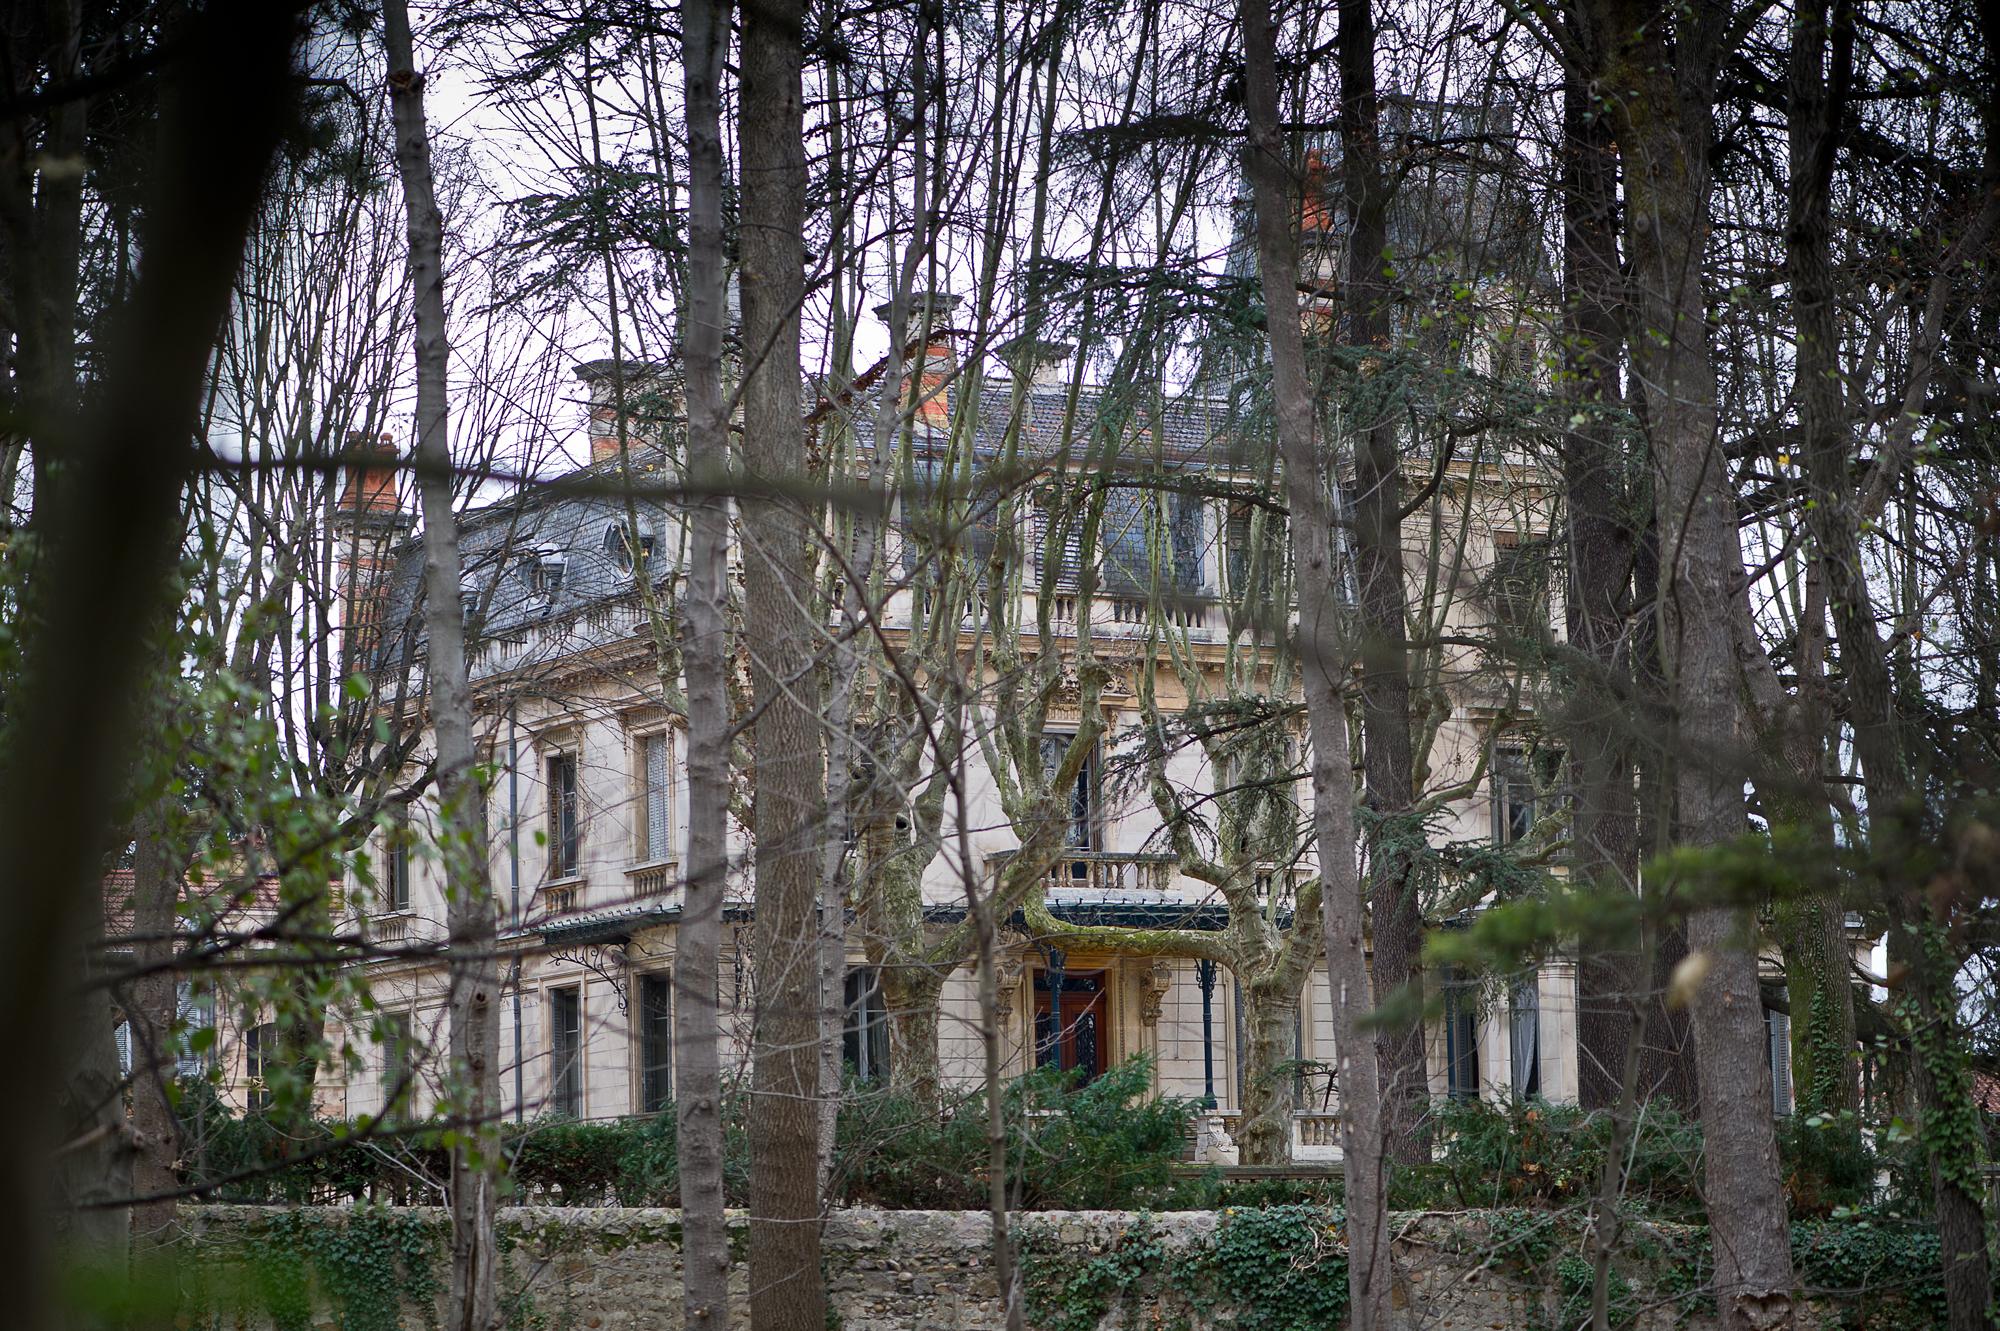 Irigny France  city photos gallery : Irigny, villa Bagatelle parc et villa Wikimedia Commons